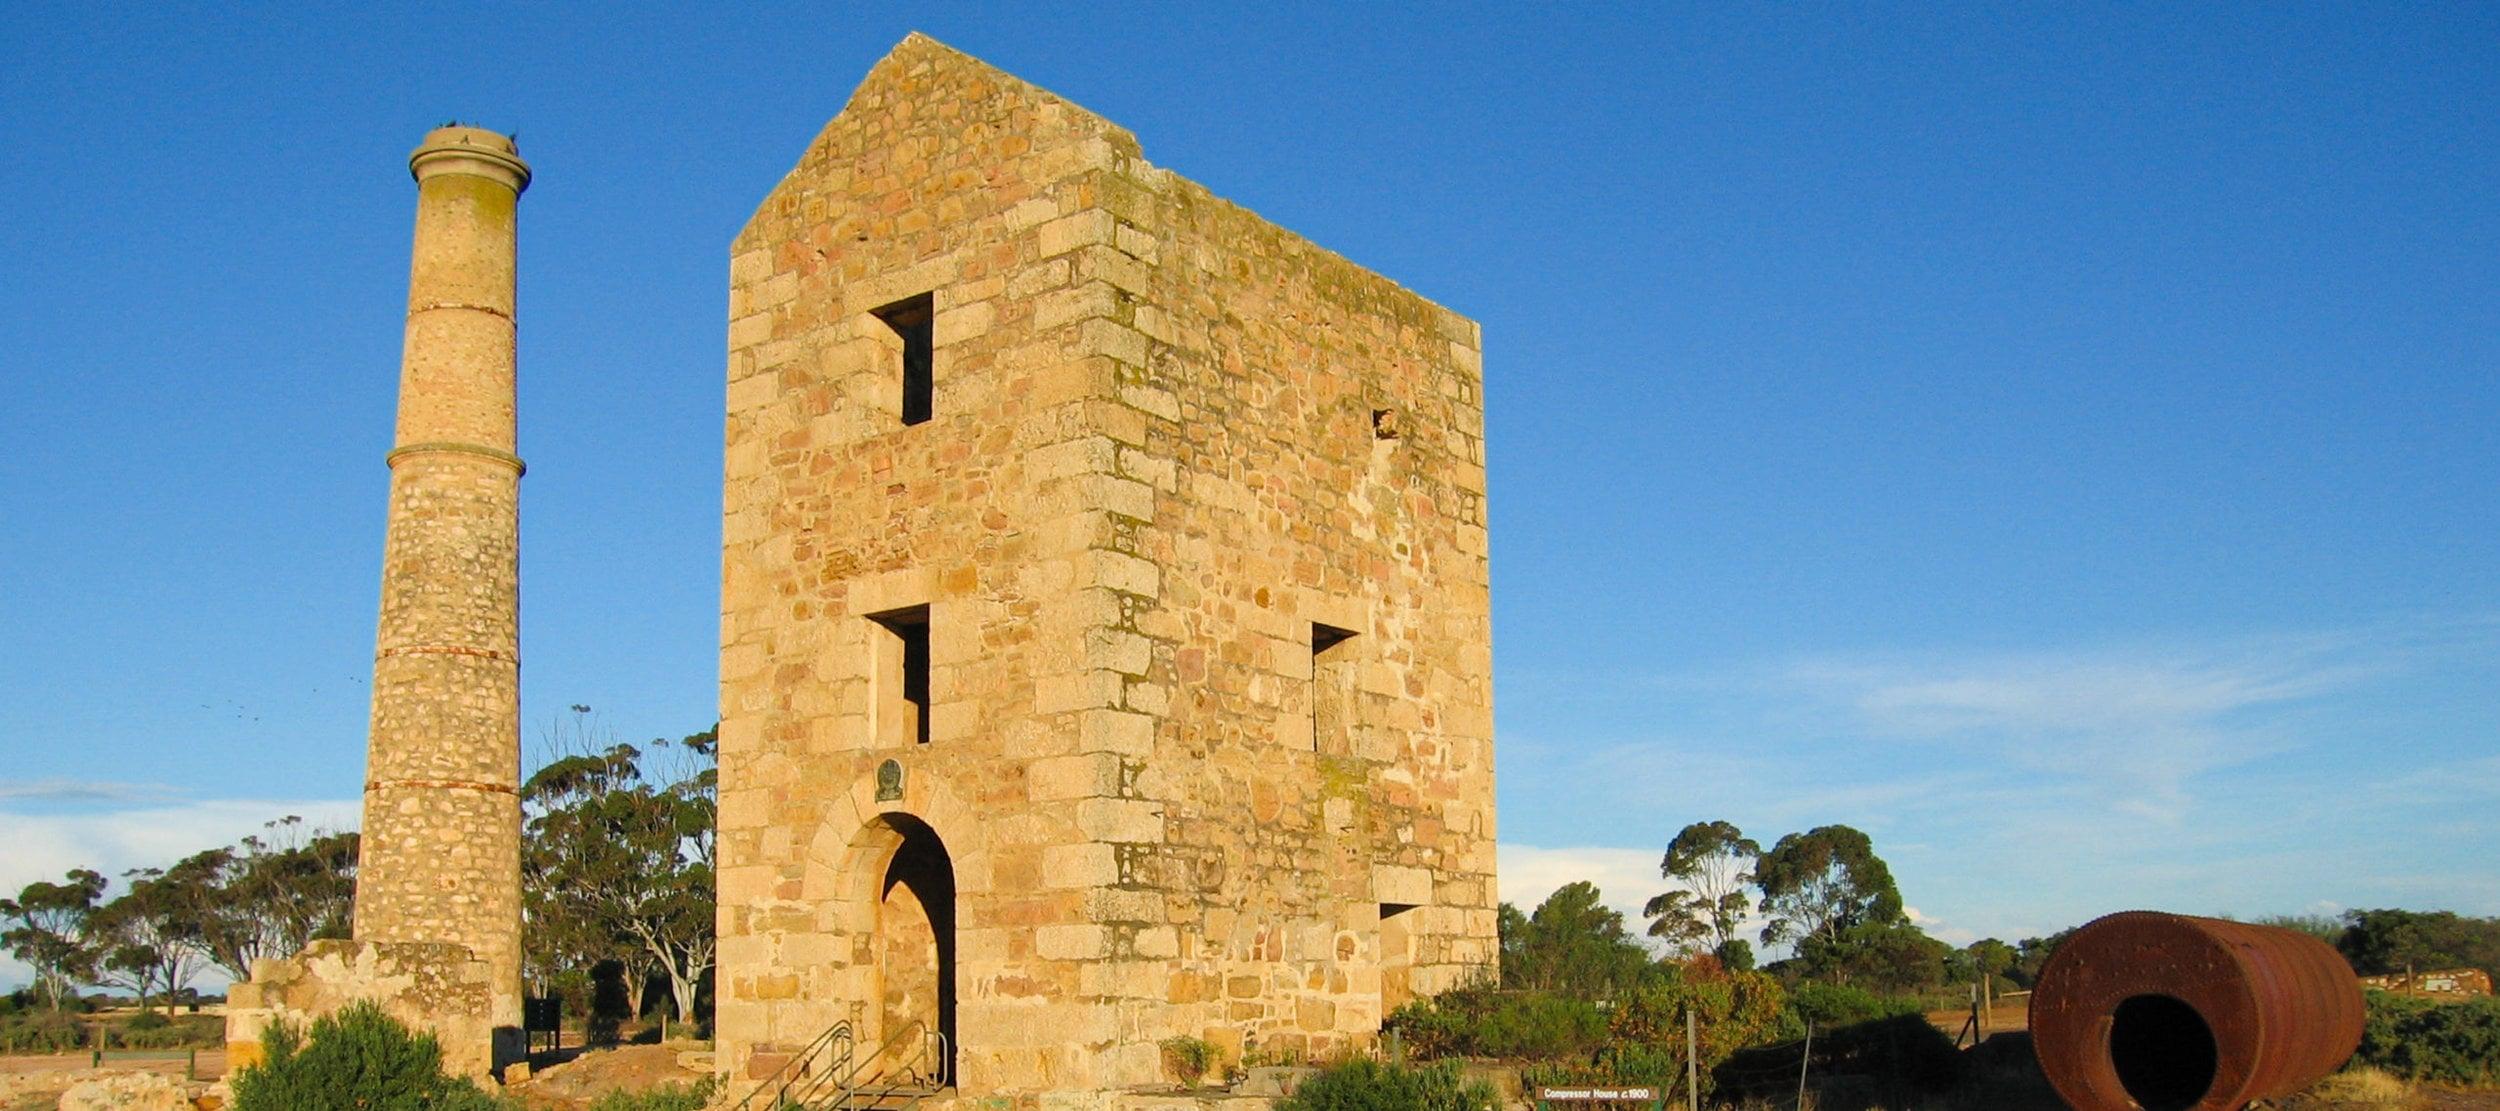 Cousin Jacks built Hughes's engine house, Moonta Mine, Australia